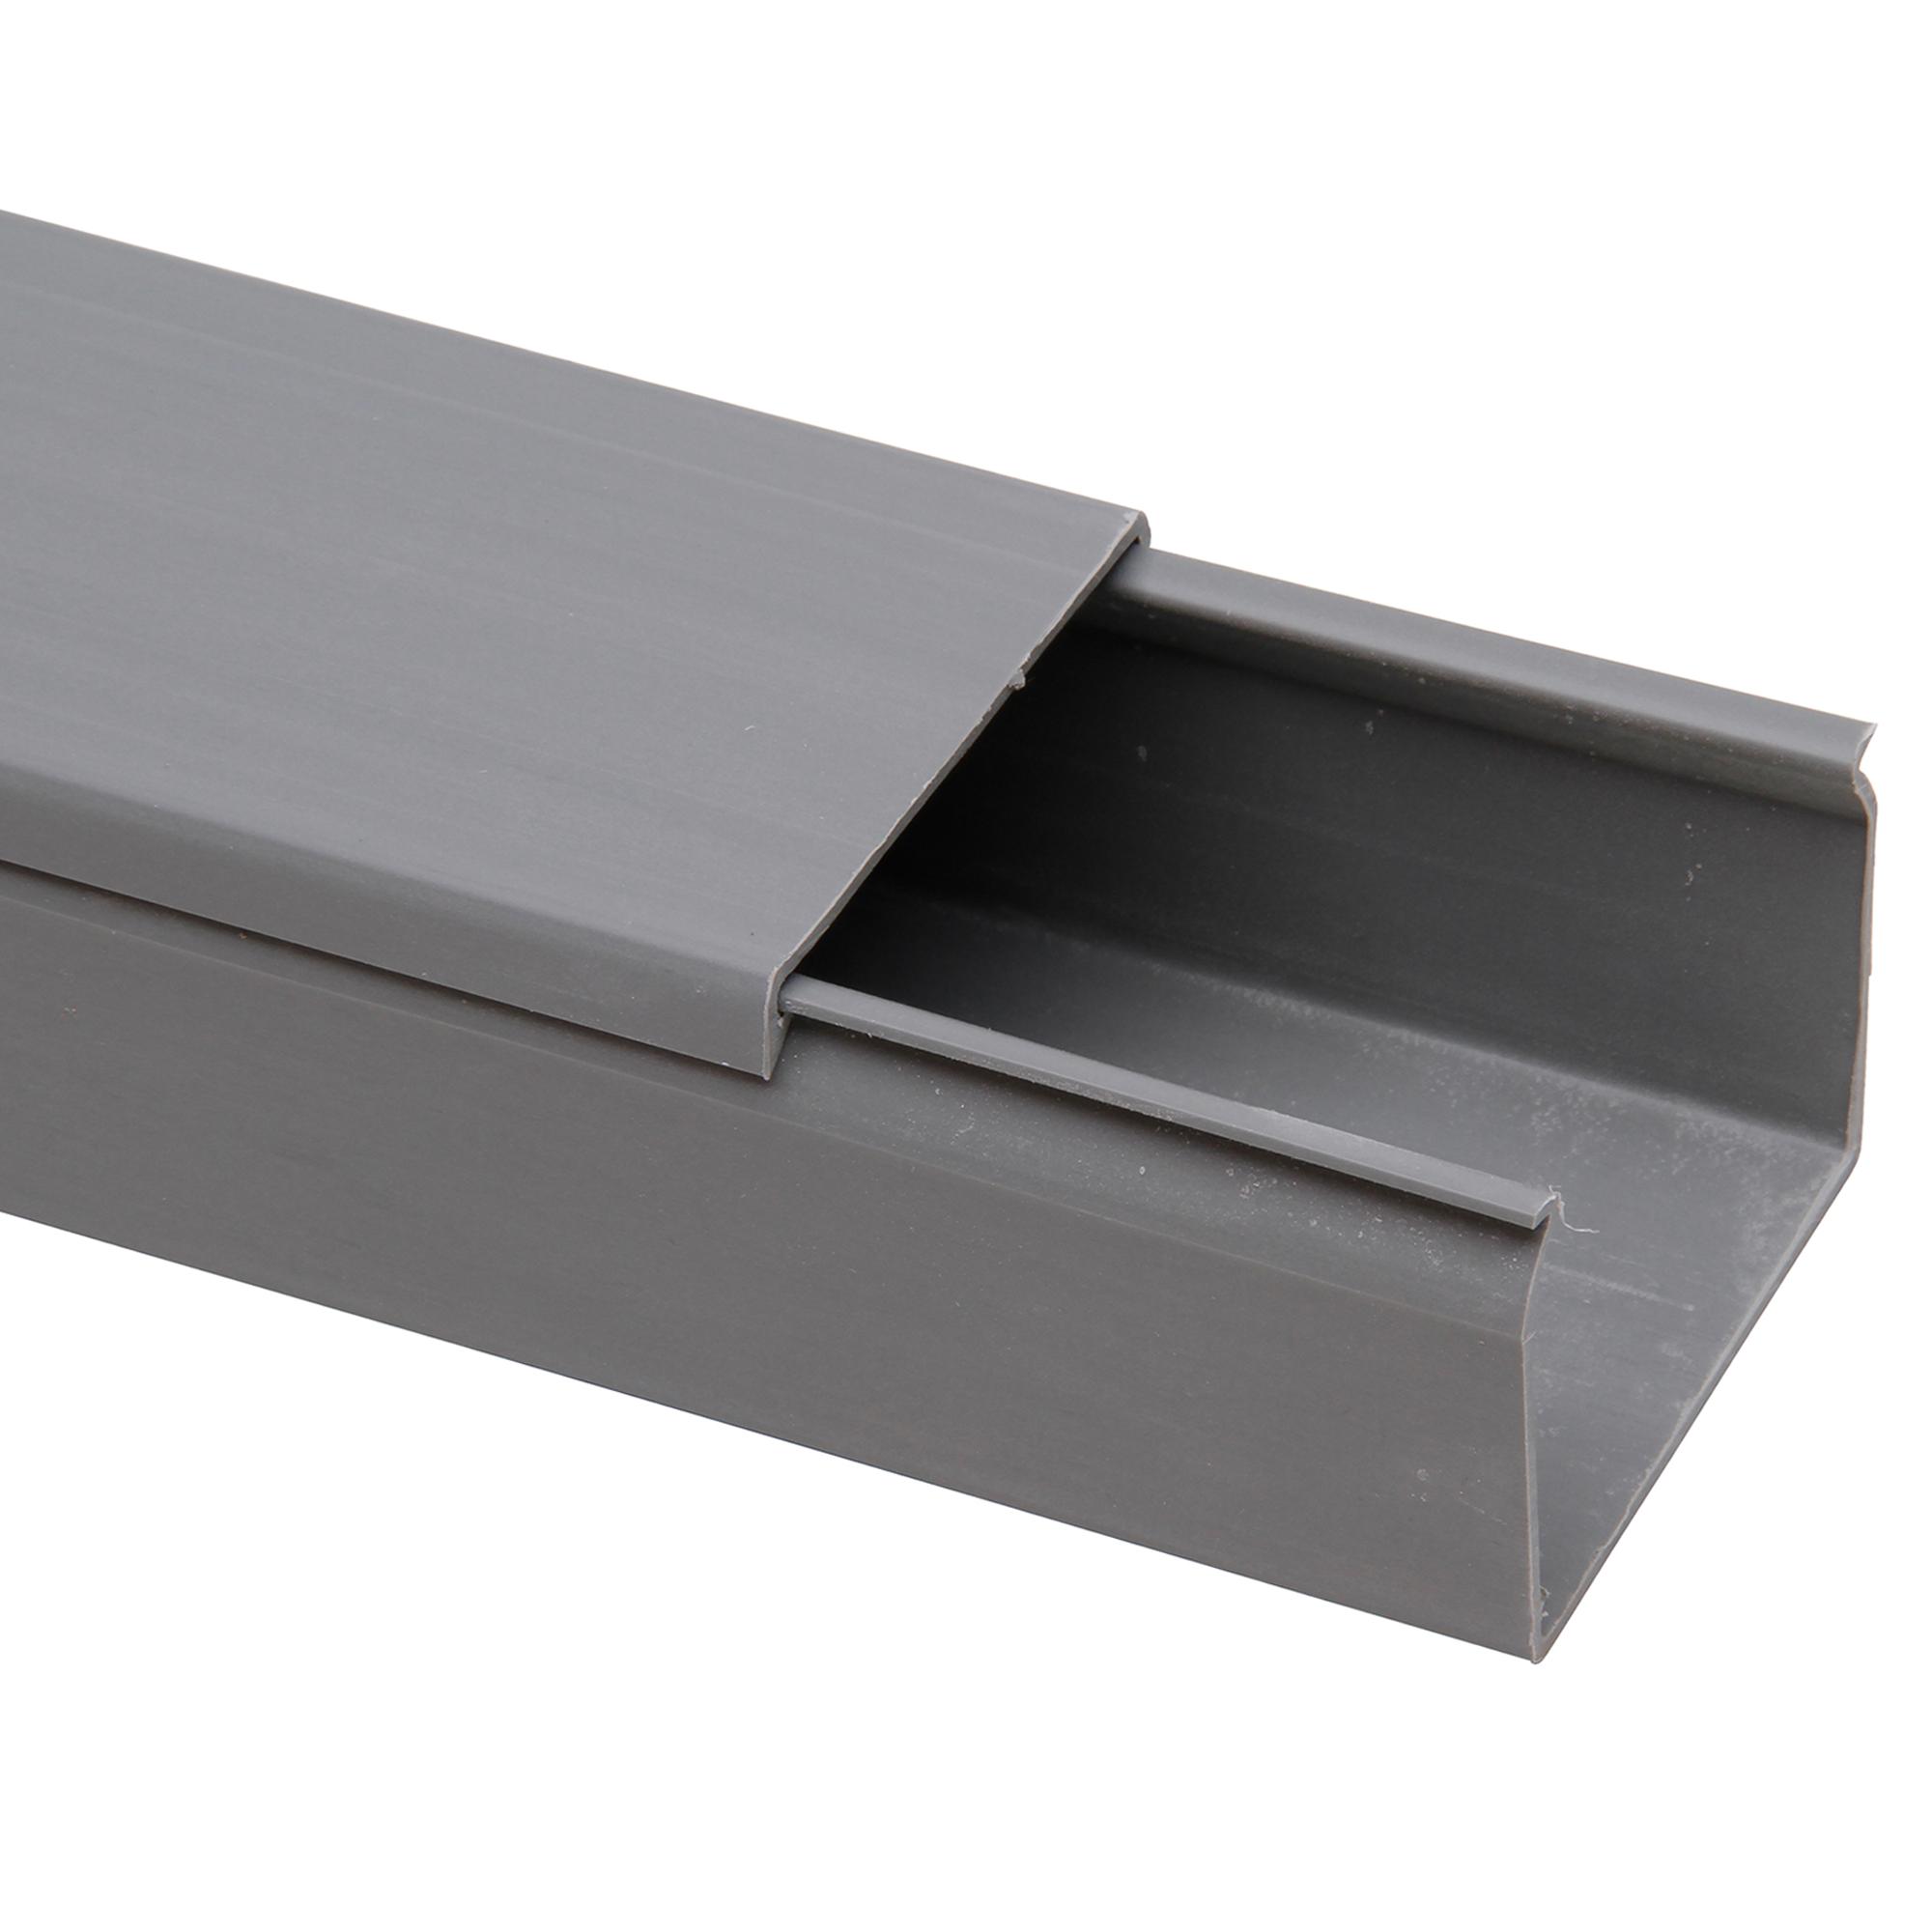 Kopp Kabelkanal grau 2000 x 60 x 40 mm ǀ toom Baumarkt